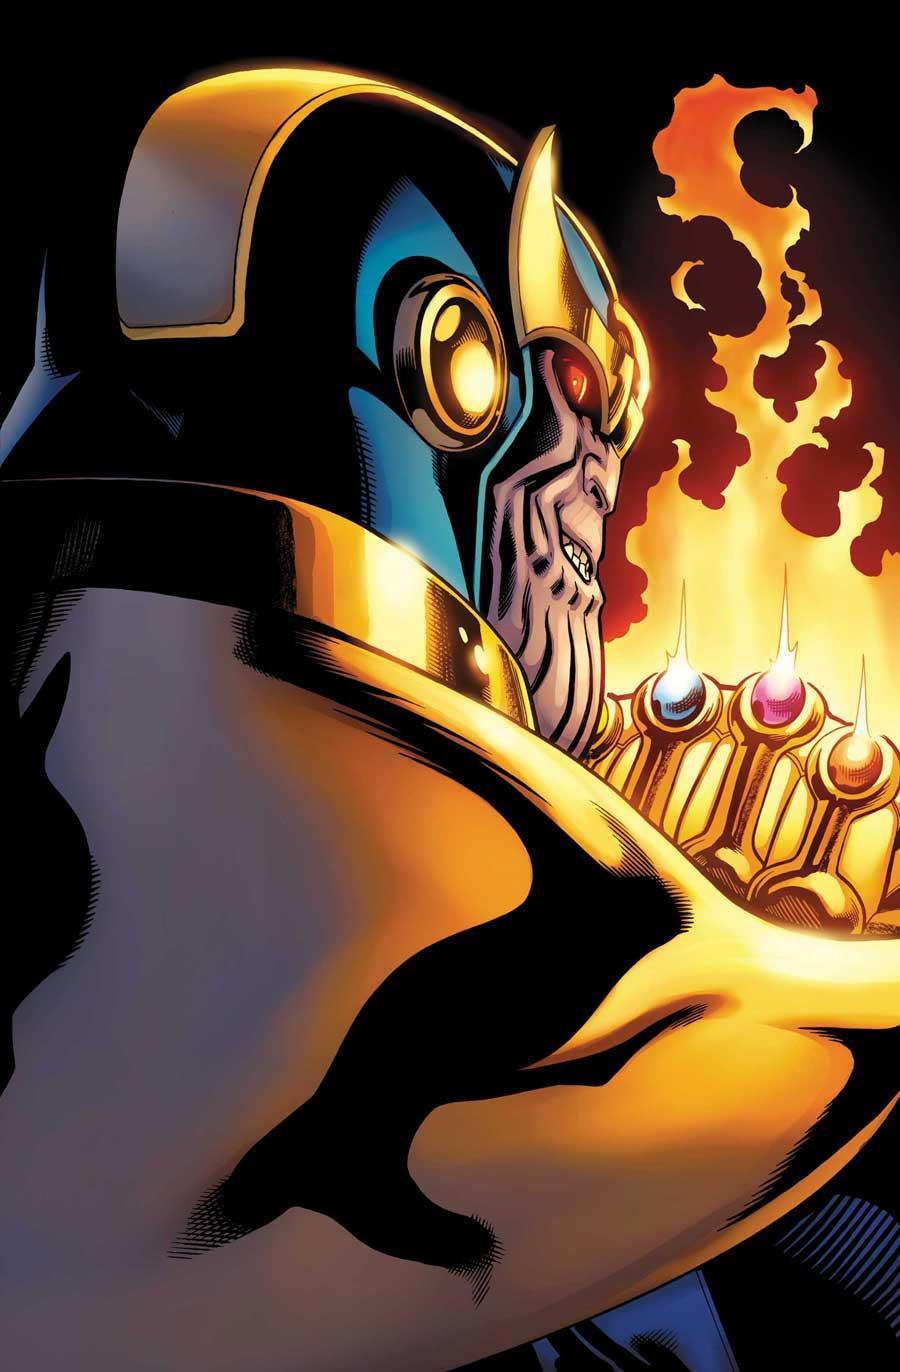 kevin-feige-discusses-infinity-gems-in-marvels-movie-universe.jpg